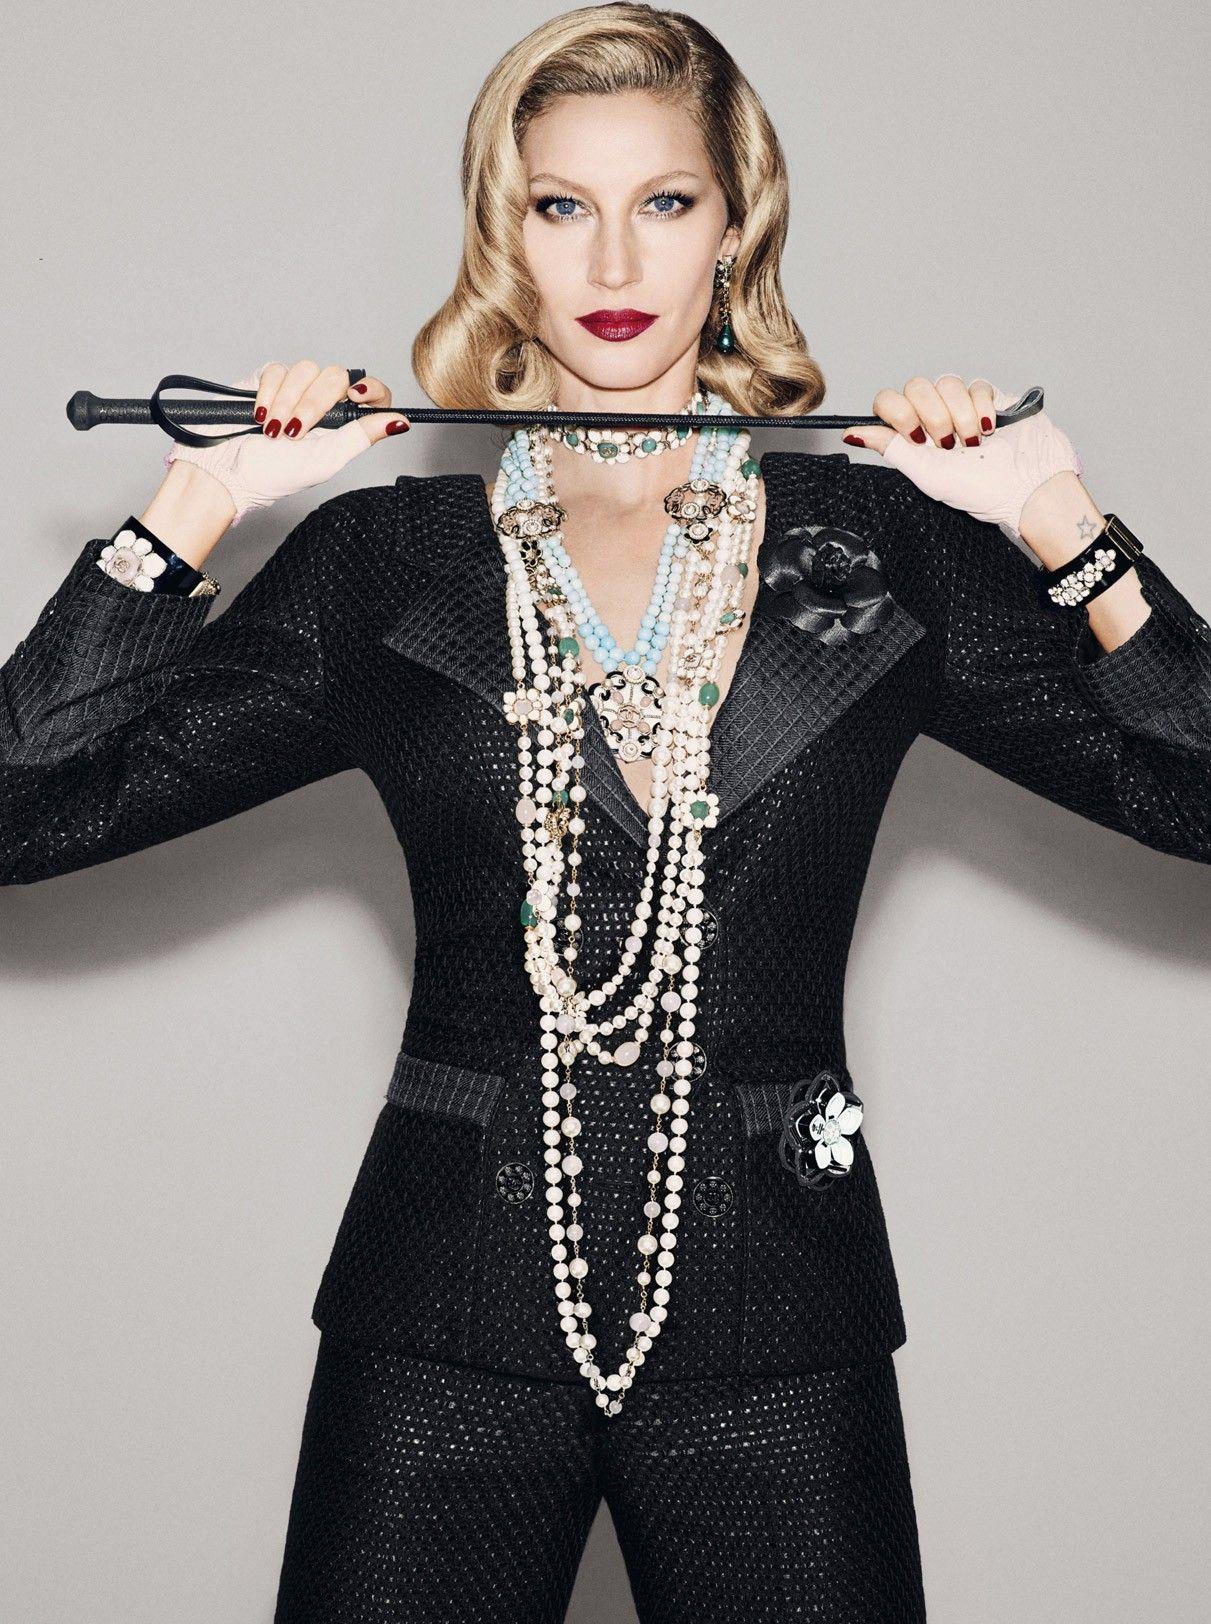 Gisele Bündchen by François Nars for Vogue Brazil December 2015 @voguebrasil